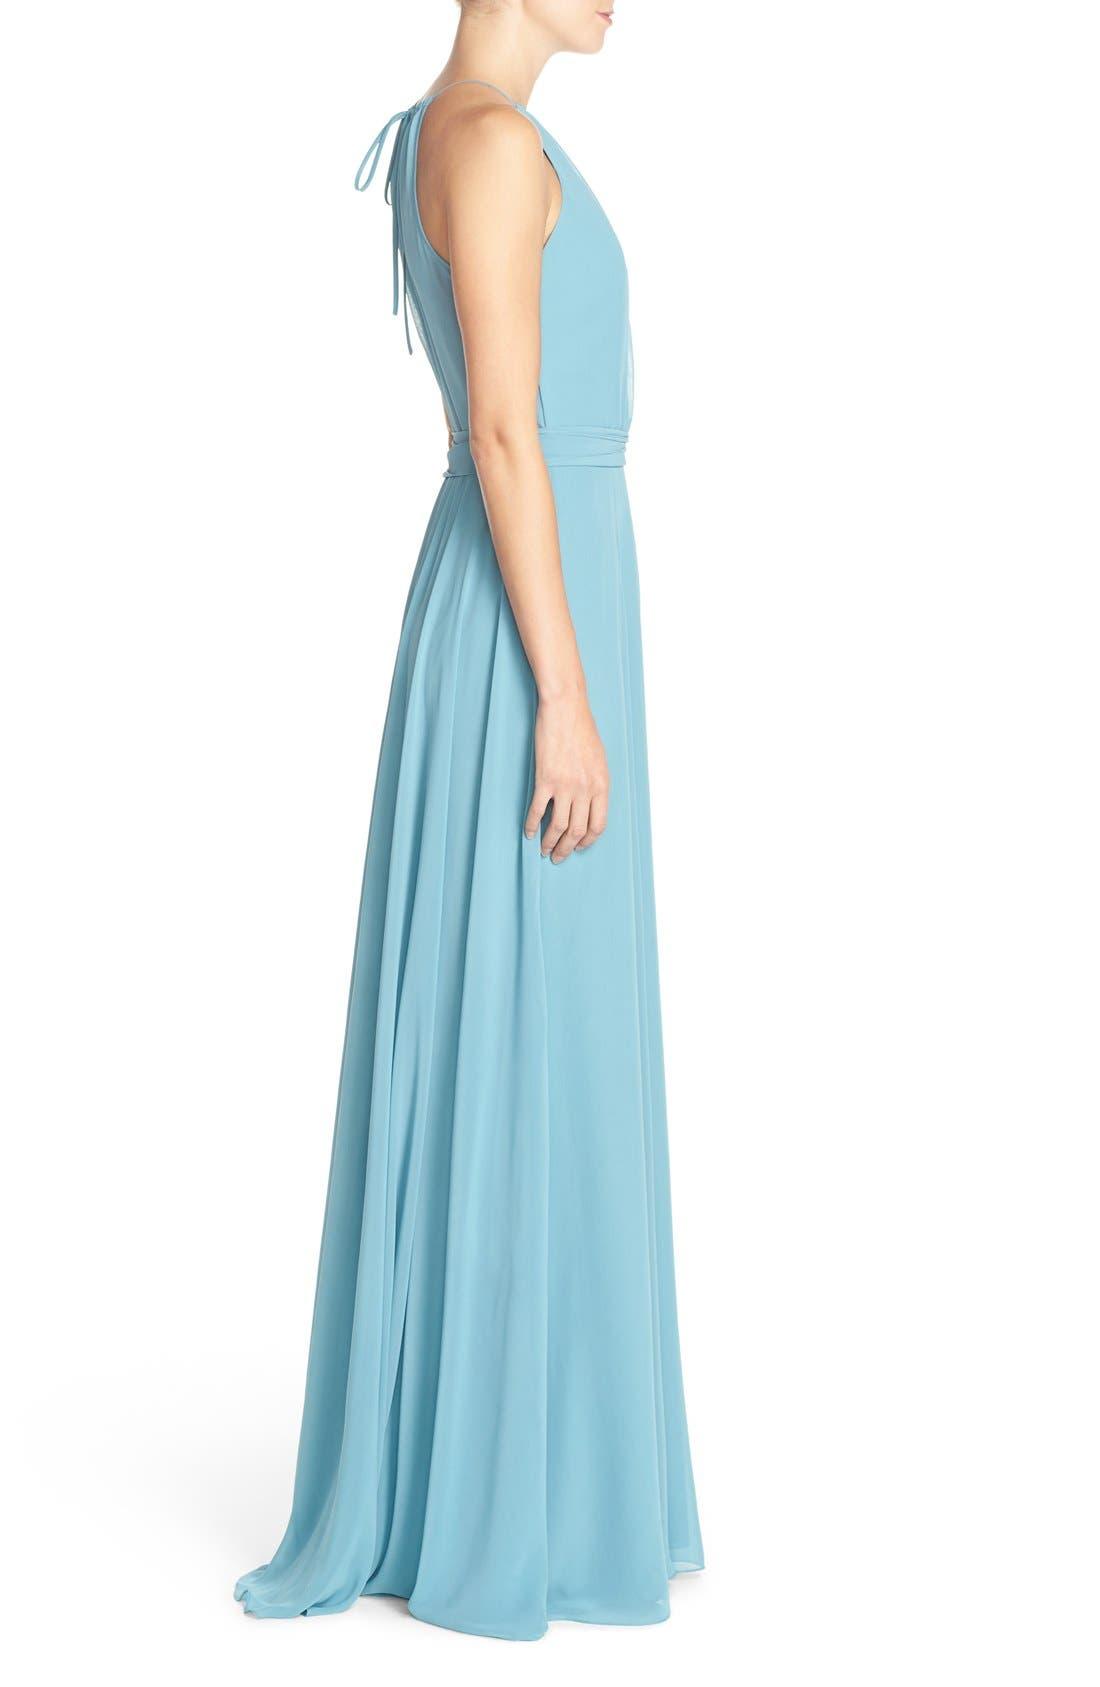 'Delaney' Belted A-Line Chiffon Halter Dress,                             Alternate thumbnail 9, color,